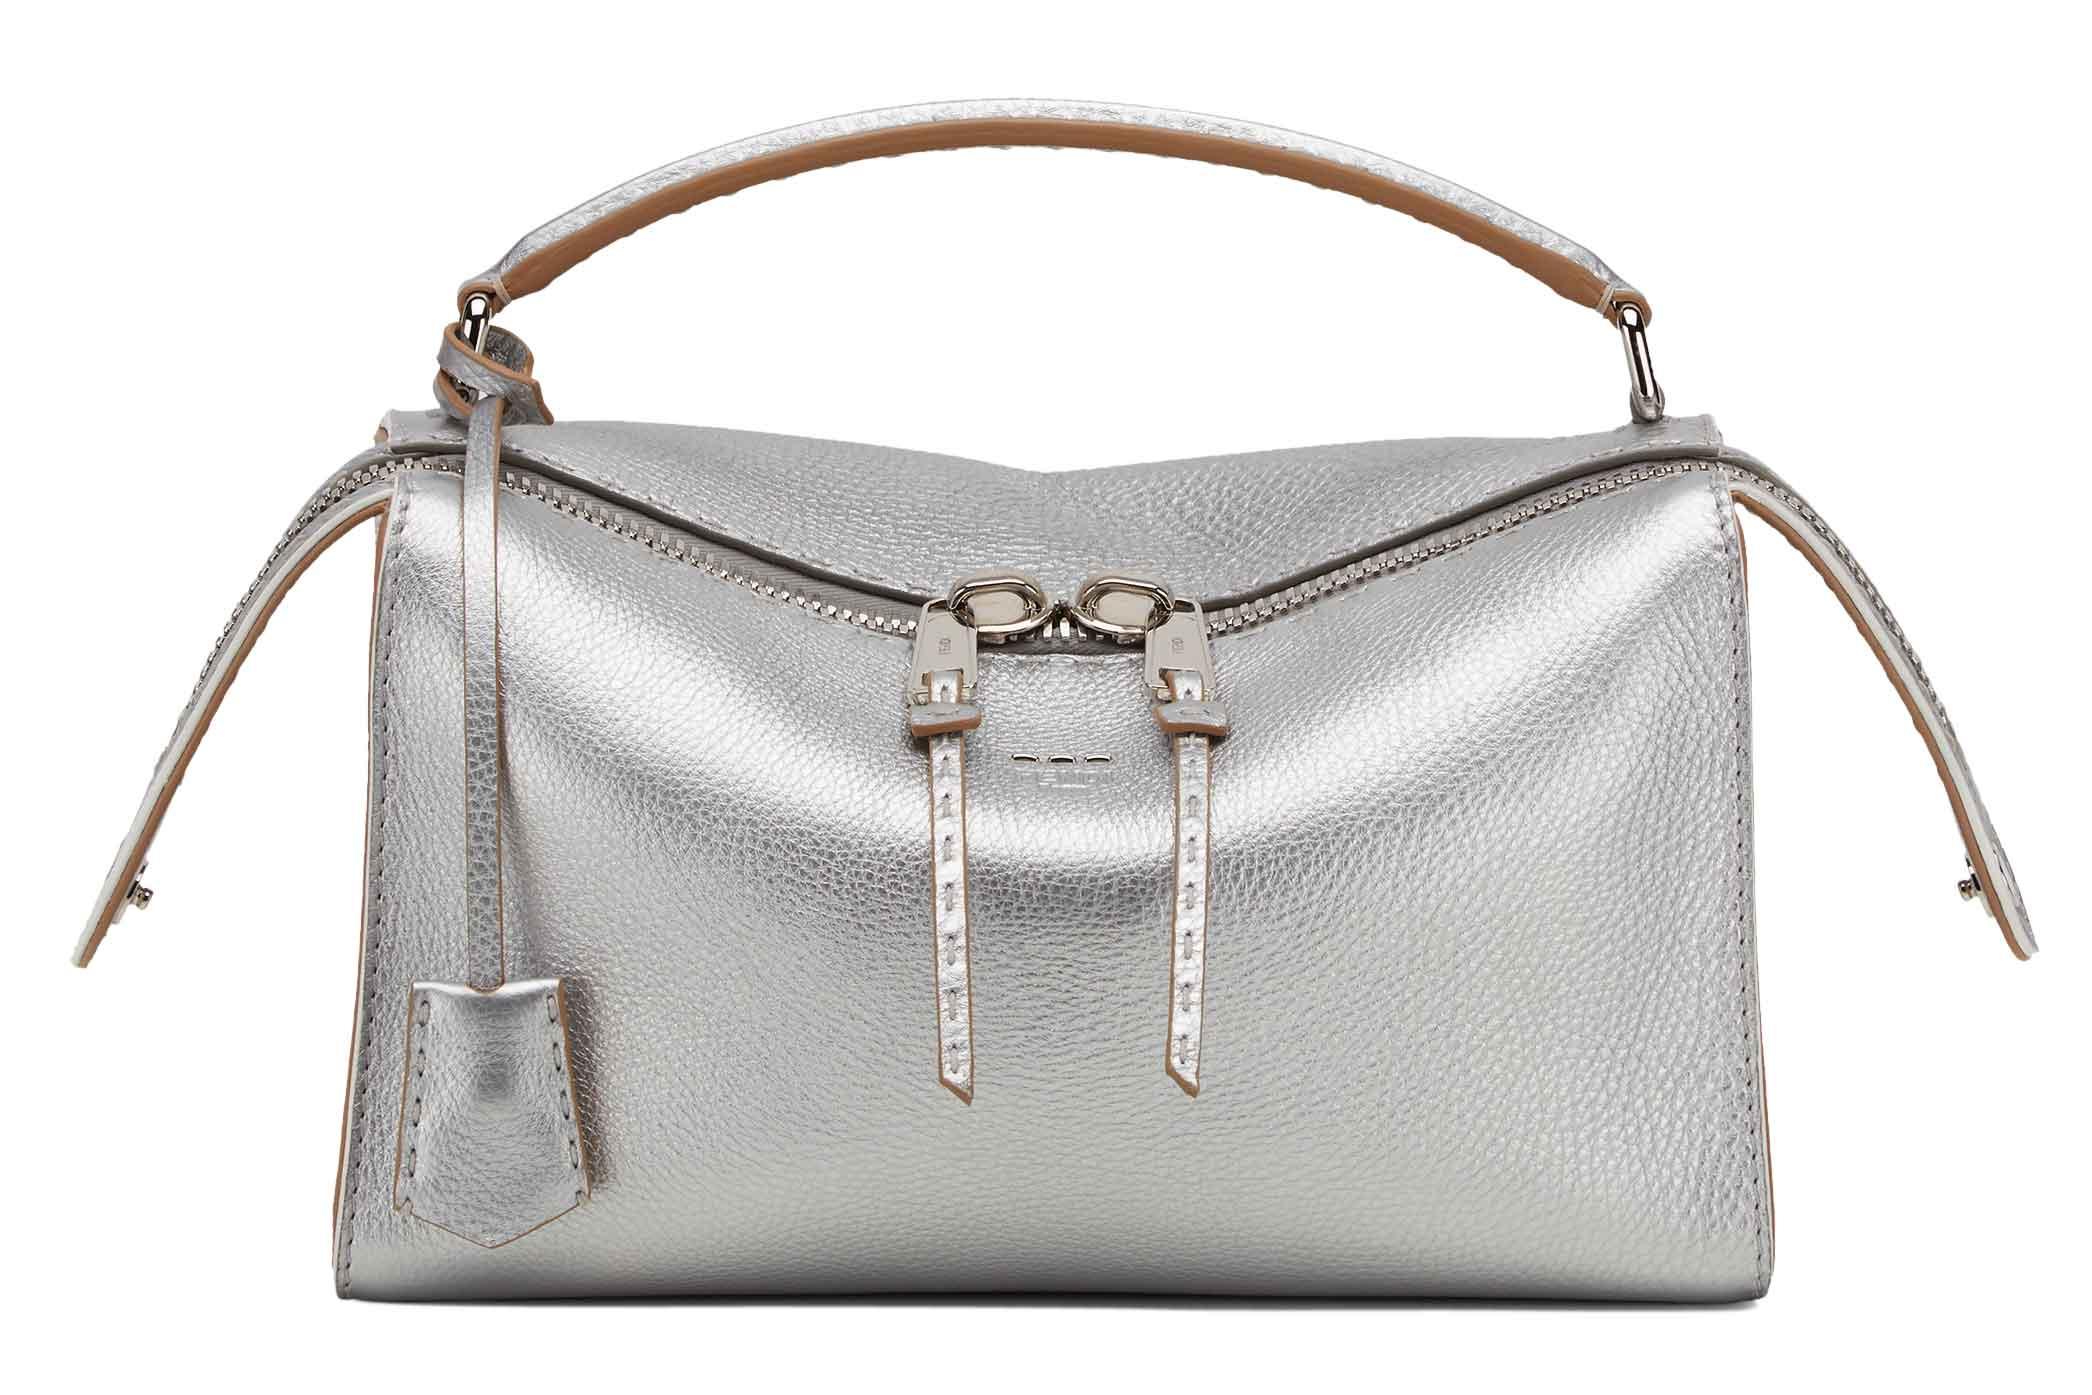 The New IT Bag: Sambut Tas Lei Dari Fendi yang Fungsional dan Gaya